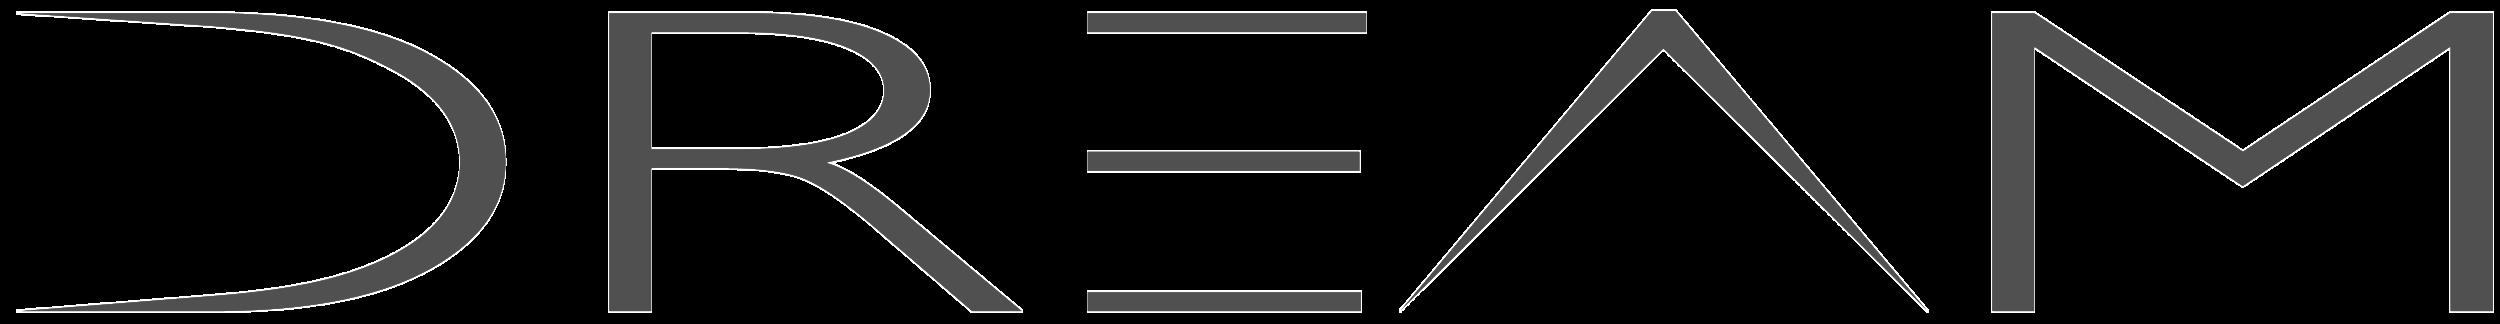 Dream-Logo-GREY-High-Res.png